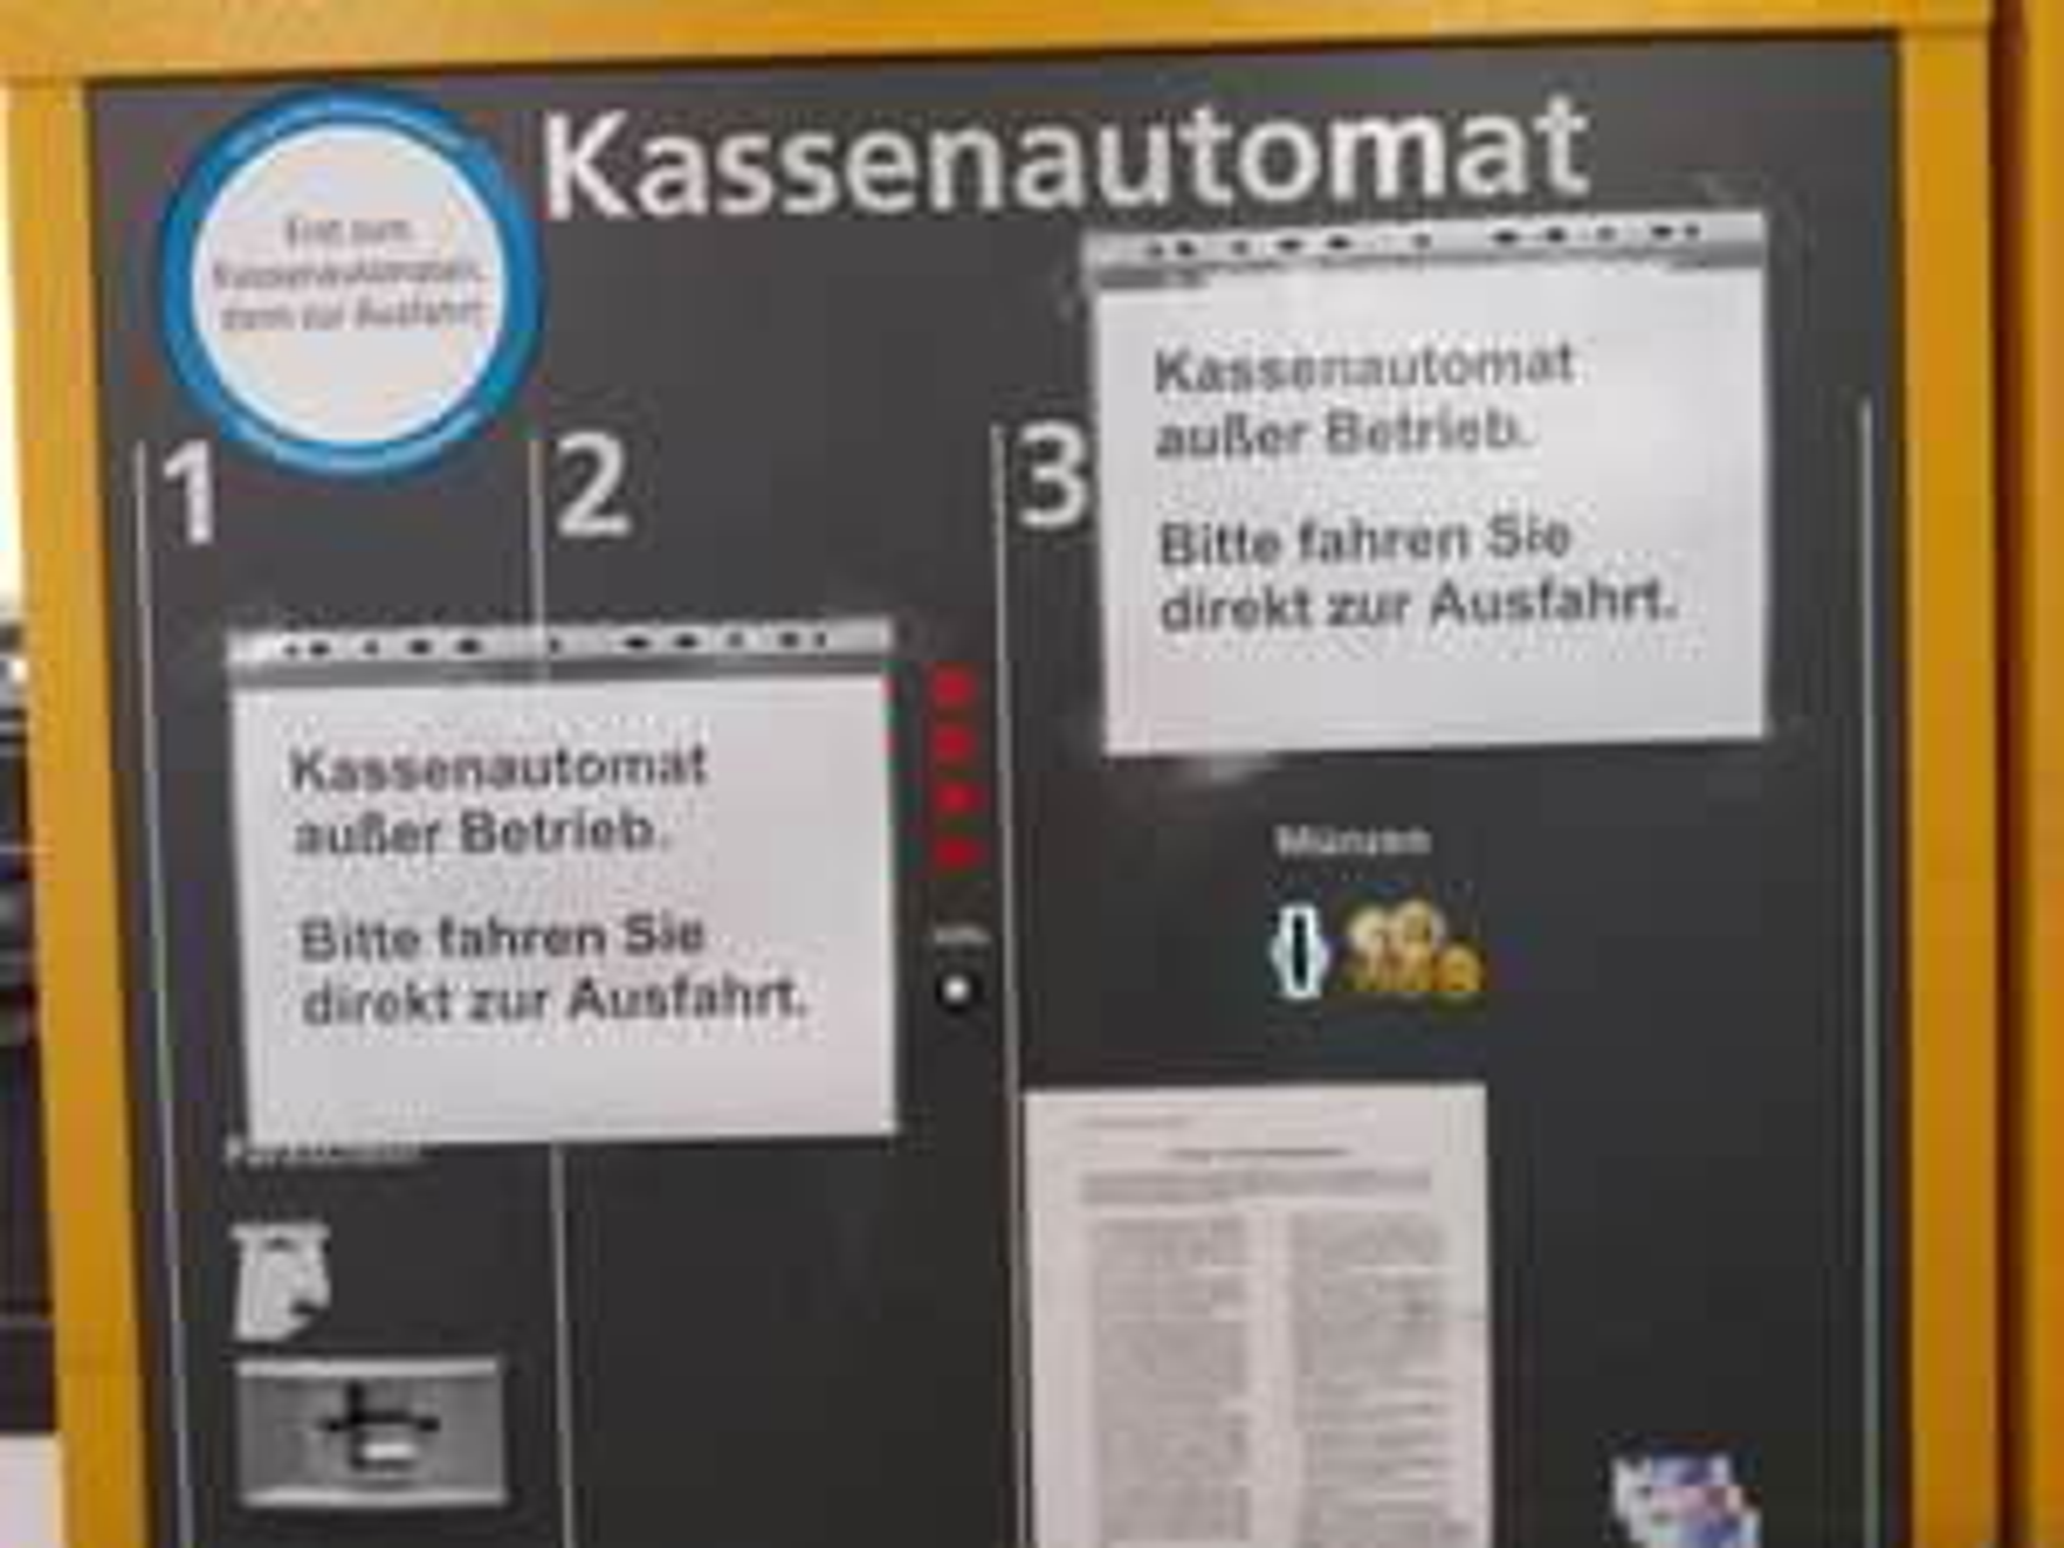 [Lokal] [Offline] [Berlin] Schöneweide Center - Den ganzen Tag gratis parken durch defekten Kassenautomaten. 100% Rabatt!!!11!!1elf!!